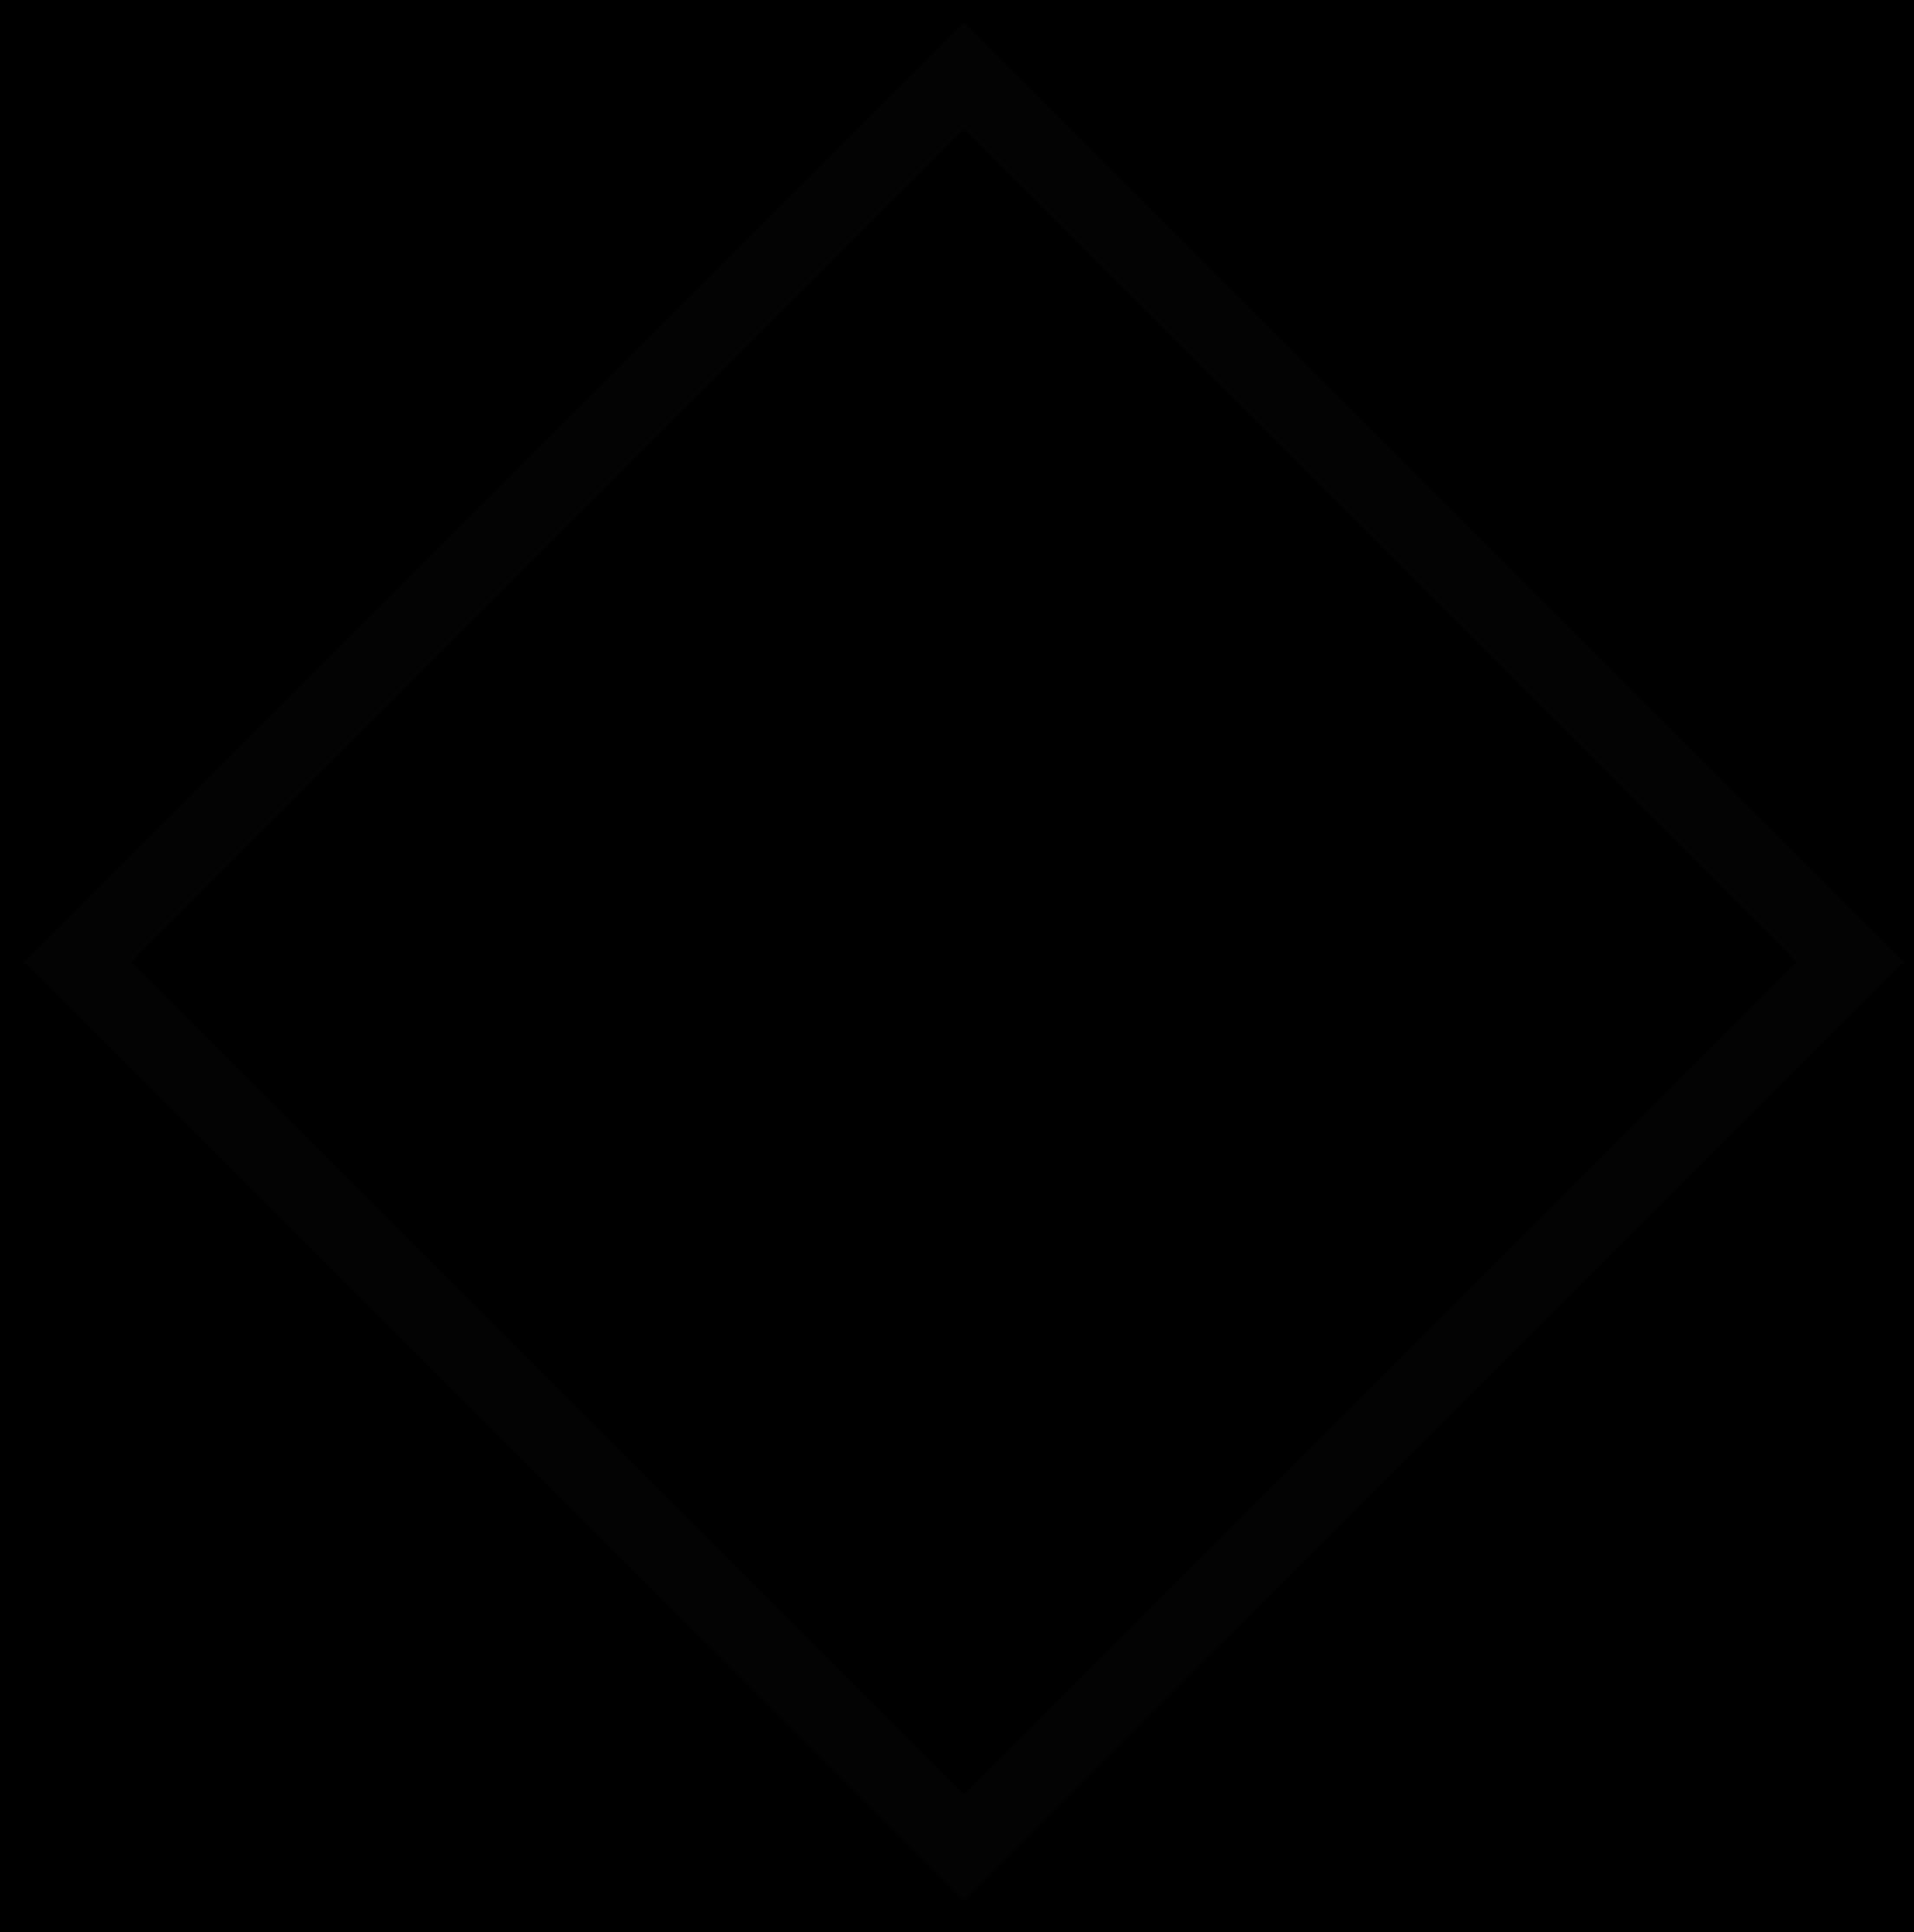 Square Triangle Rhombus Shape Diamond Geometric Rhombus Shape Geometric Rhombus